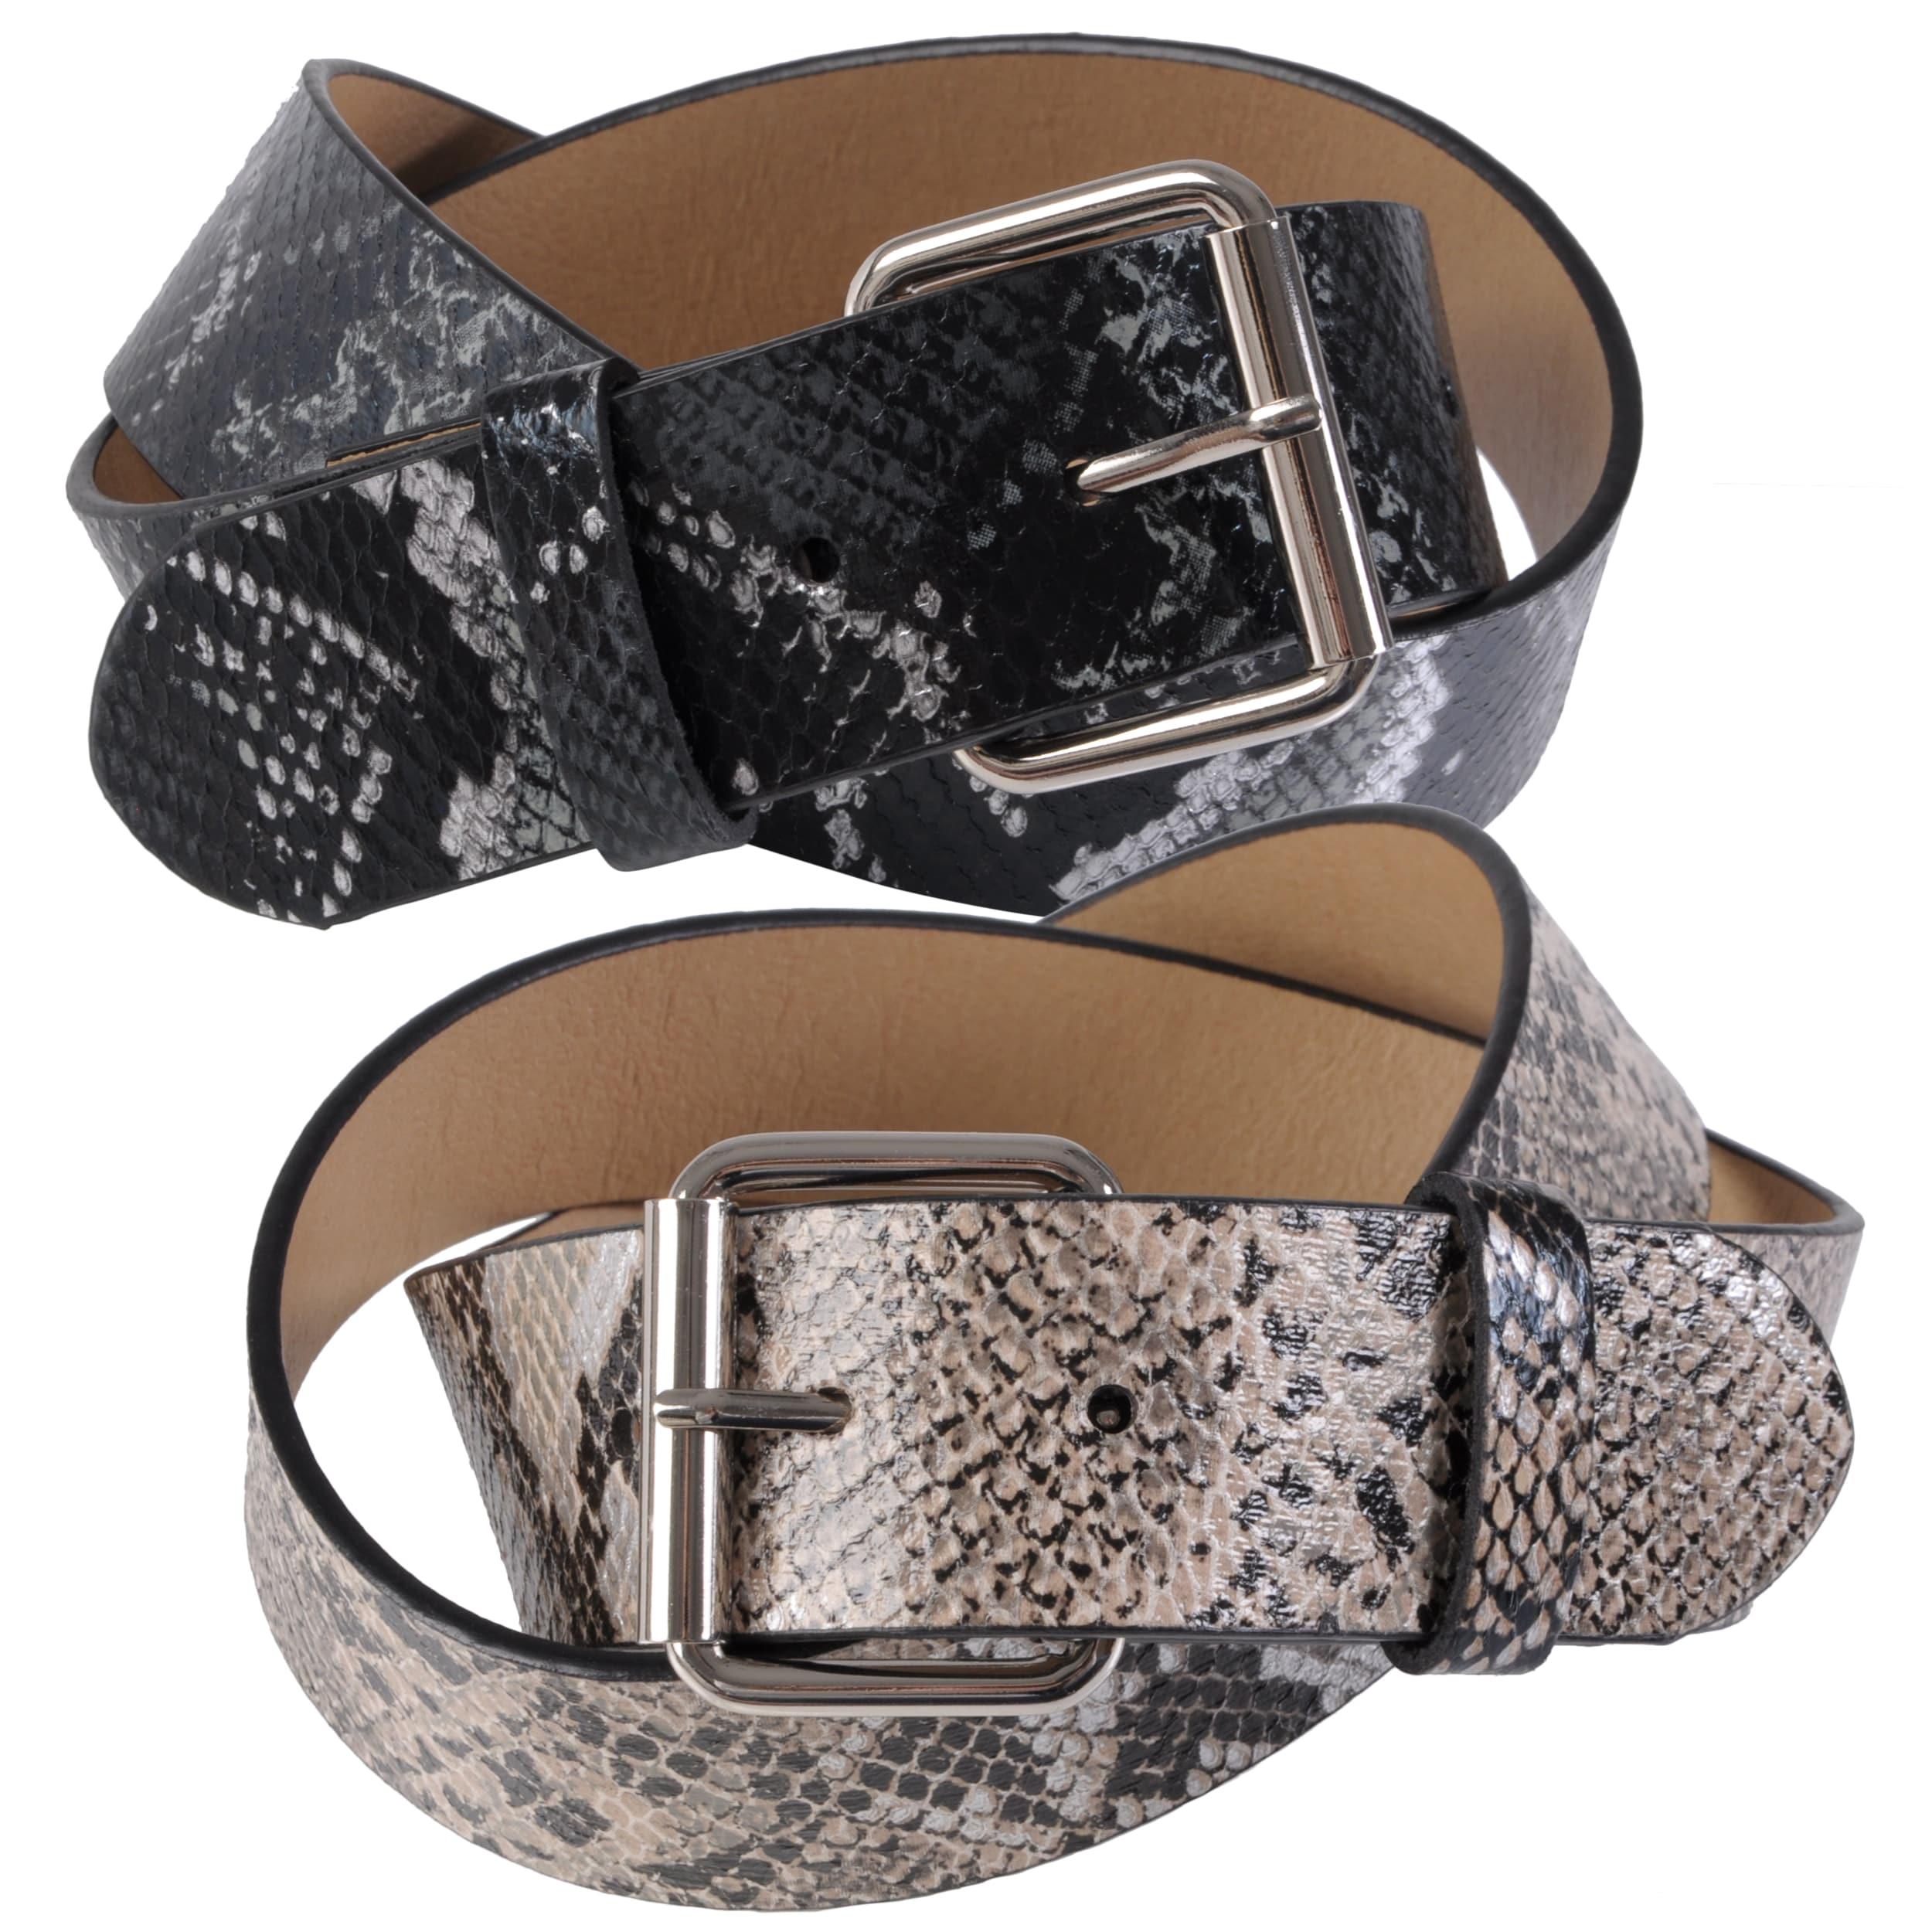 Journee Collection Women's Python Print Casual Belt